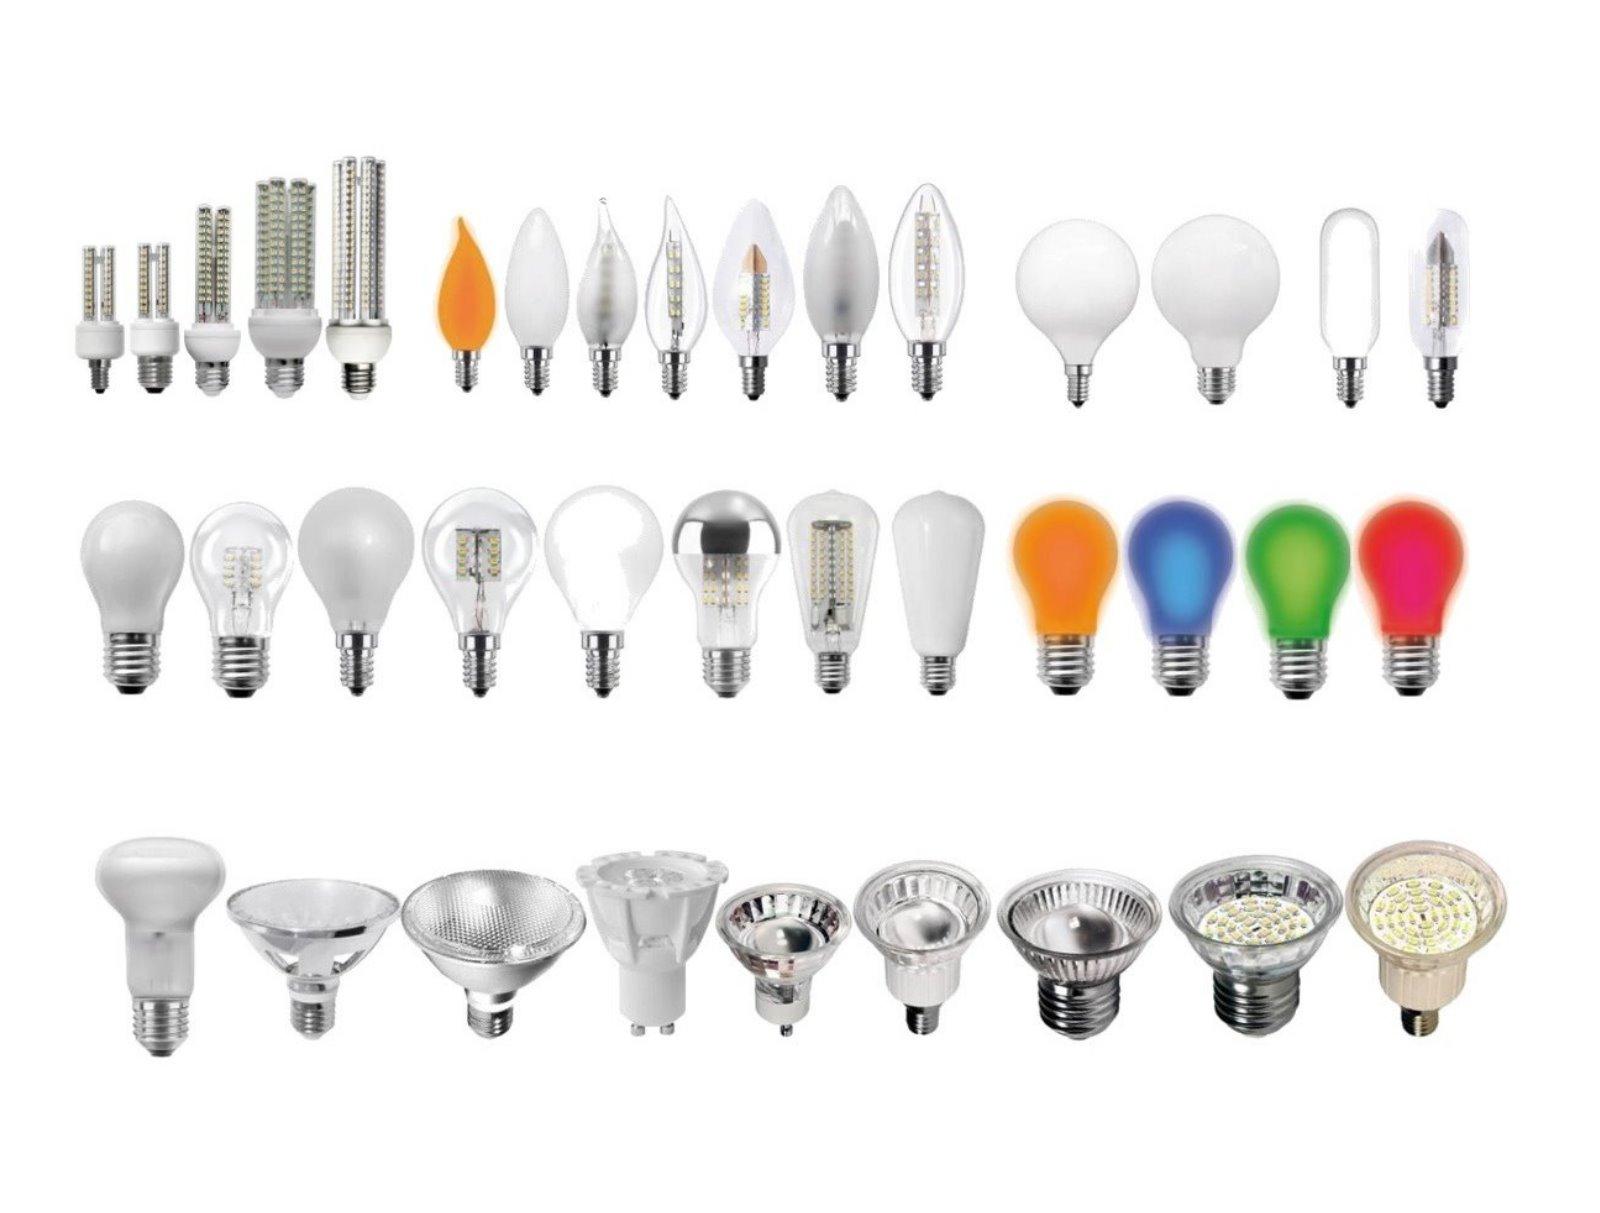 energiesparlampe dimmbar deckenfluter fluter r7 halogen ersatz r7s flutlicht. Black Bedroom Furniture Sets. Home Design Ideas